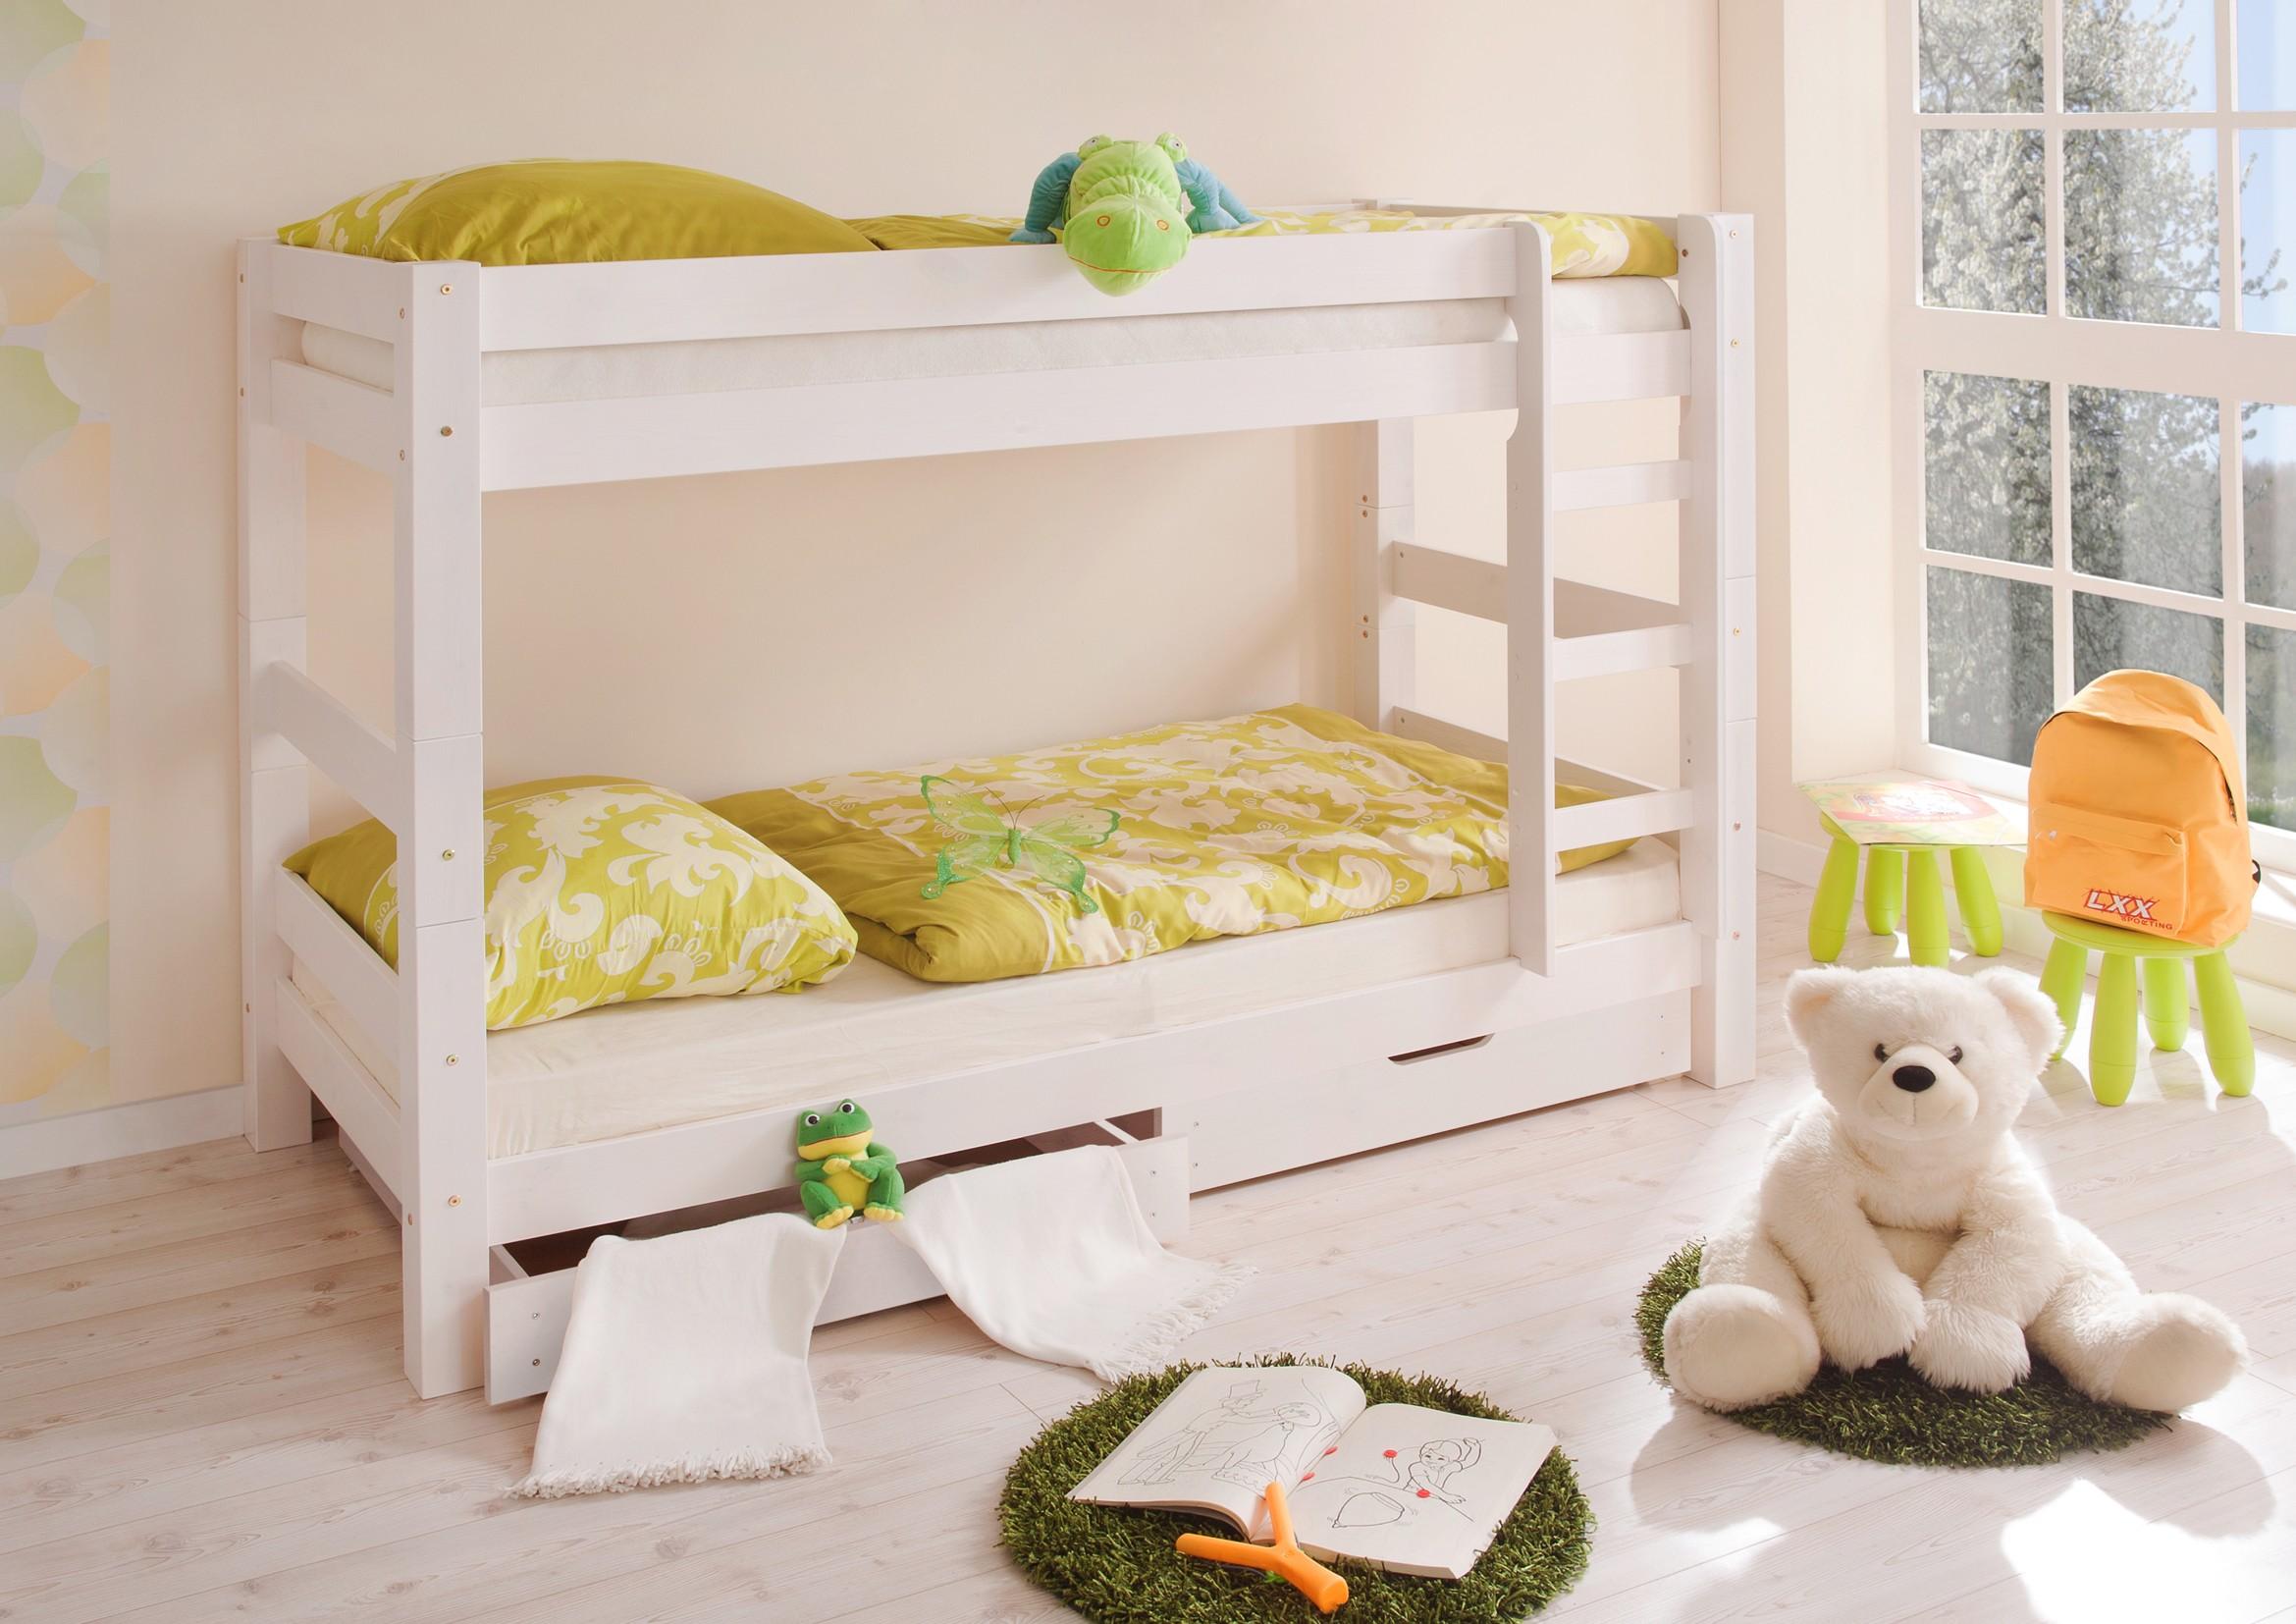 etagenbett kiefer massiv weiss h c m bel. Black Bedroom Furniture Sets. Home Design Ideas